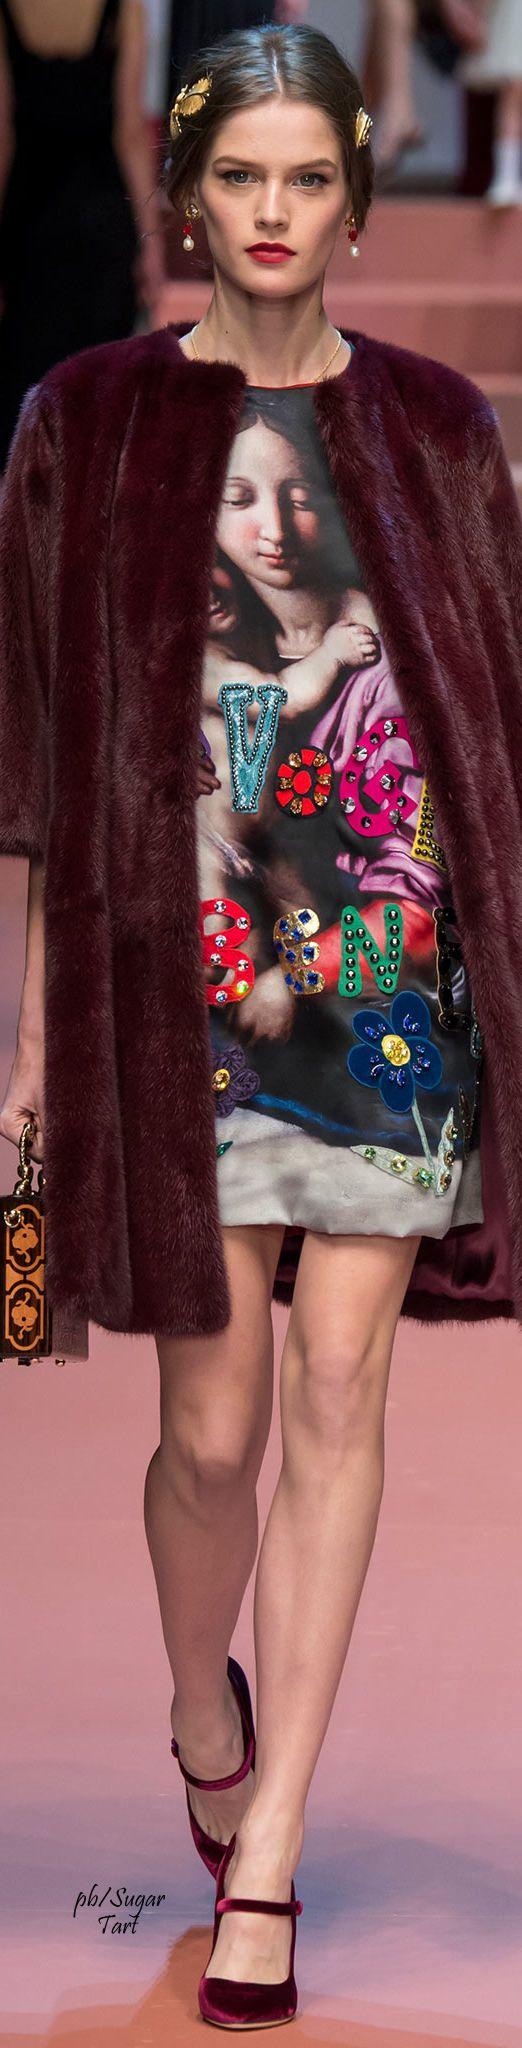 Dolce & Gabbana Fall 2015 | The House of Beccaria#